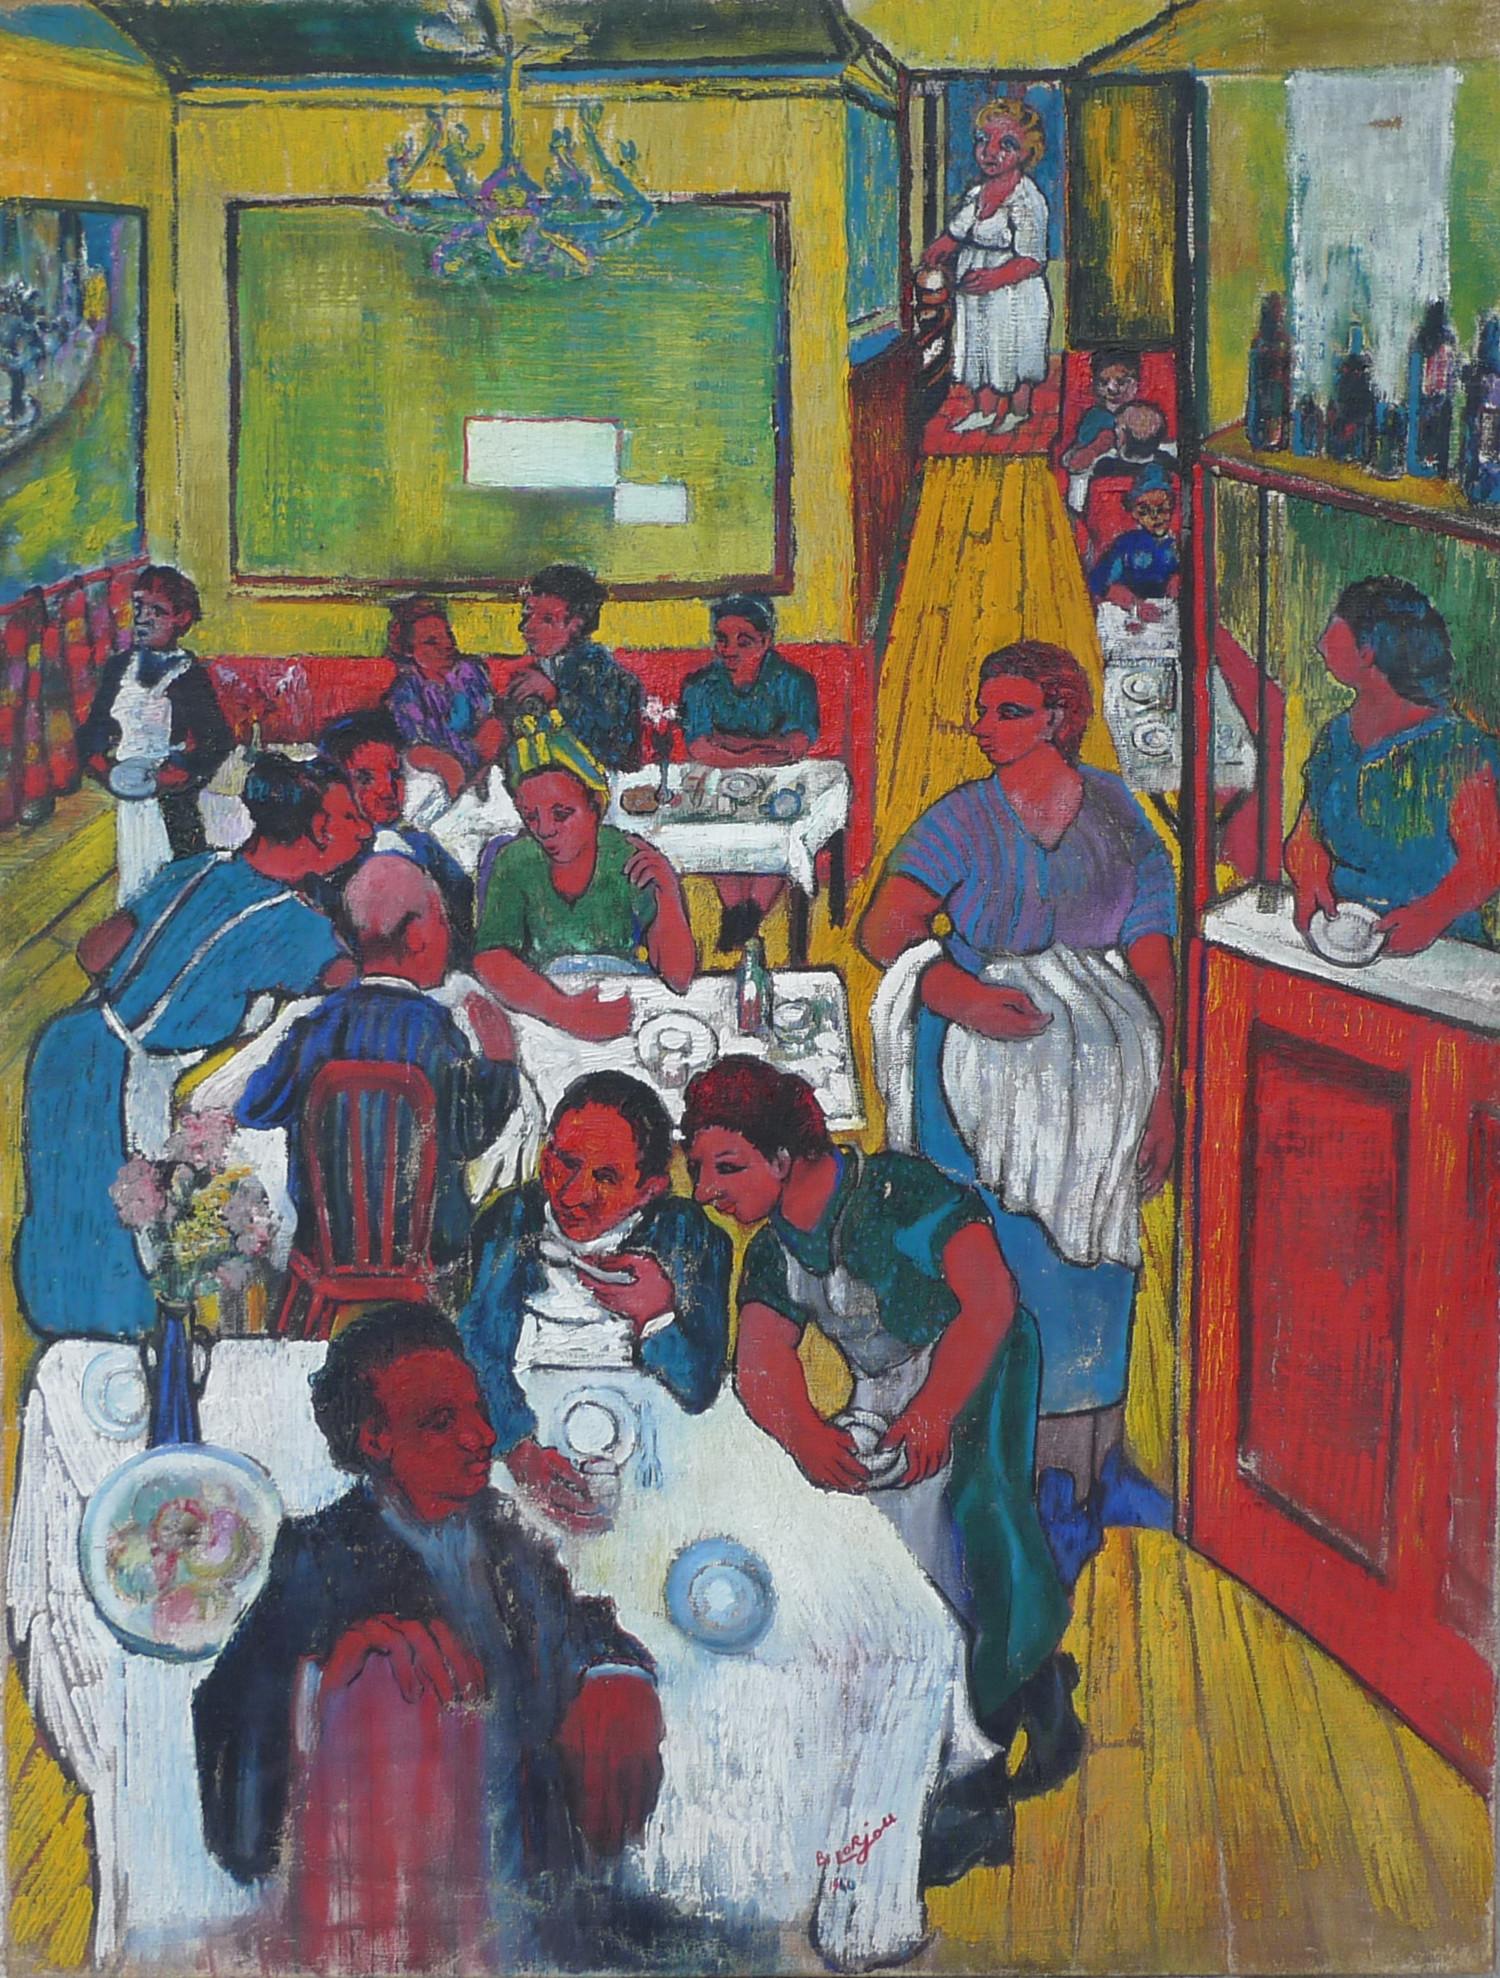 The Restaurant (La Brasserie) (1940)